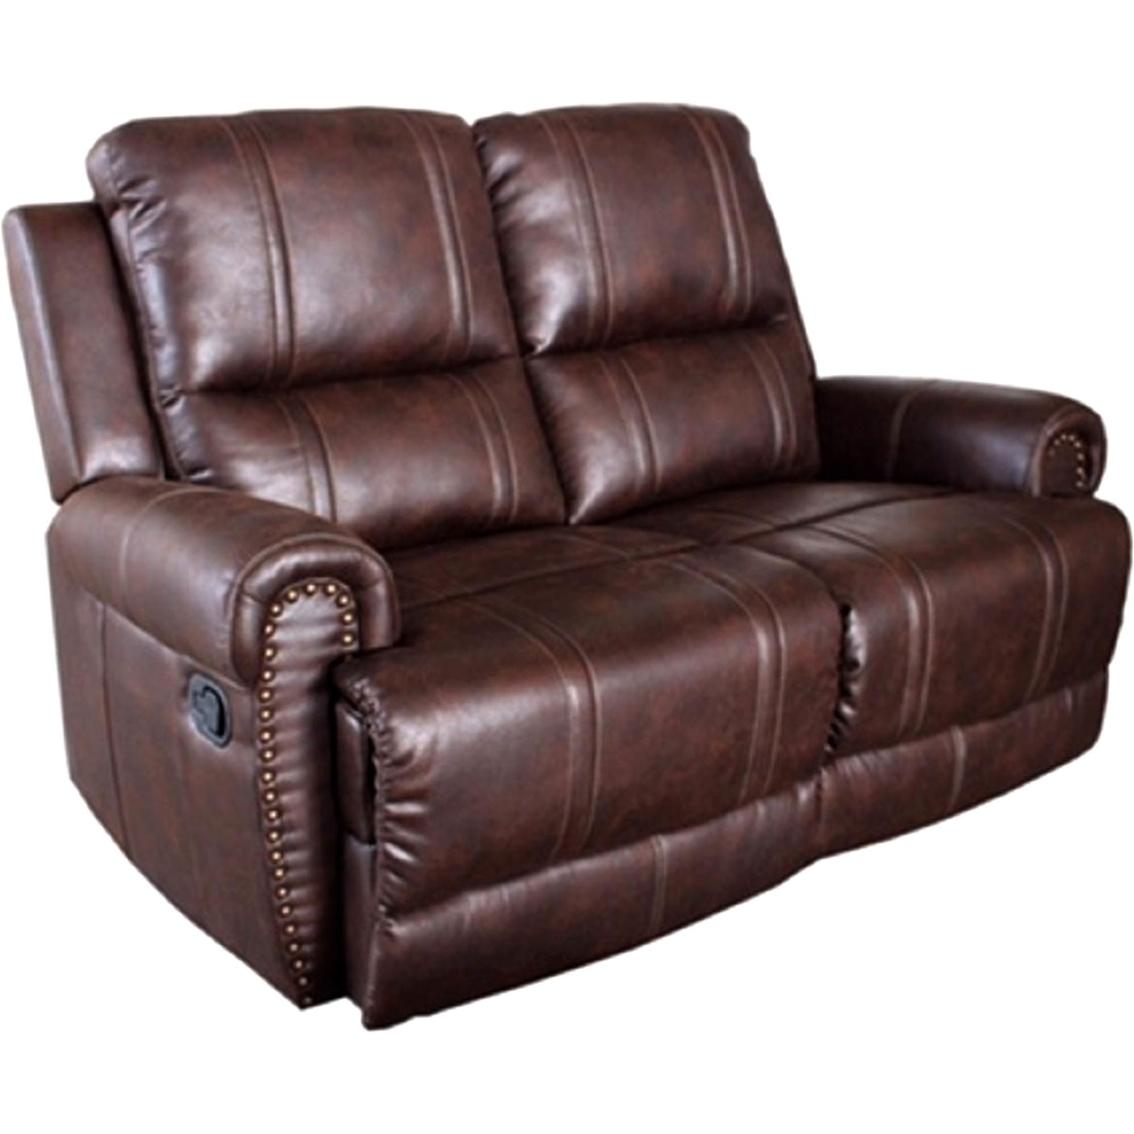 Klaussner Sofa Parts Review Home Decor